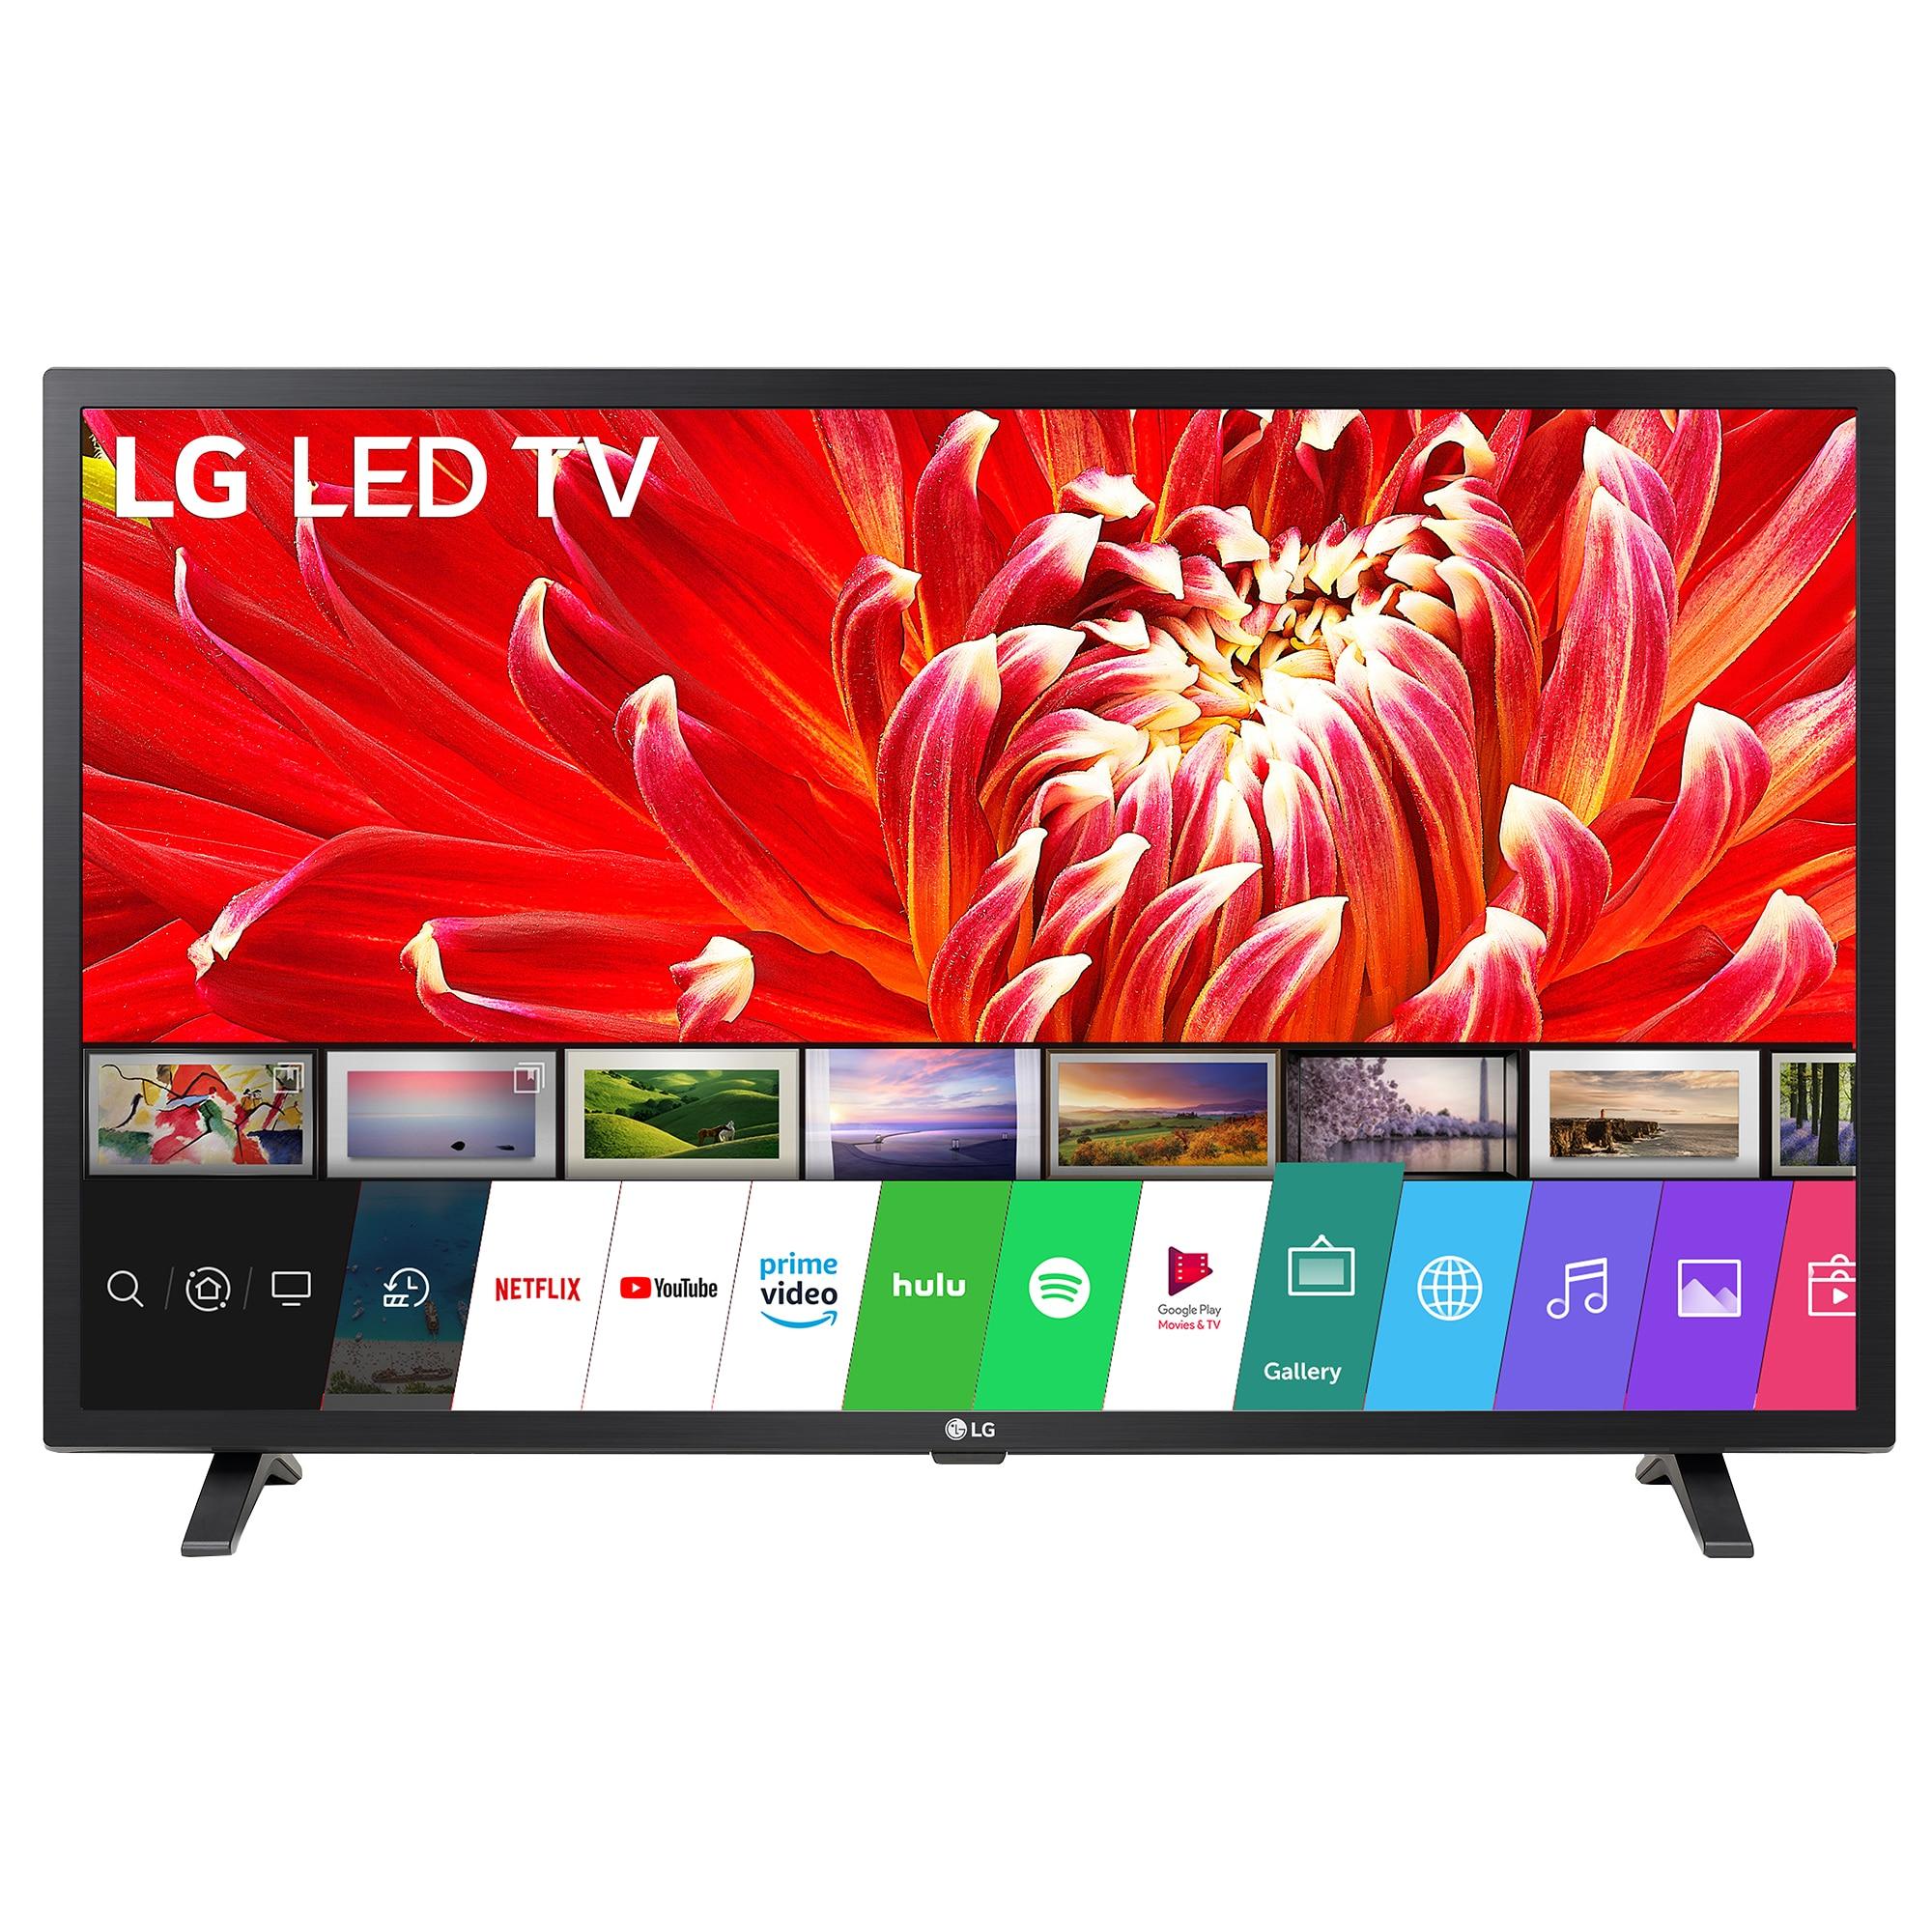 Fotografie Televizor LED Smart LG, 80 cm, 32LM6300PLA, Full HD